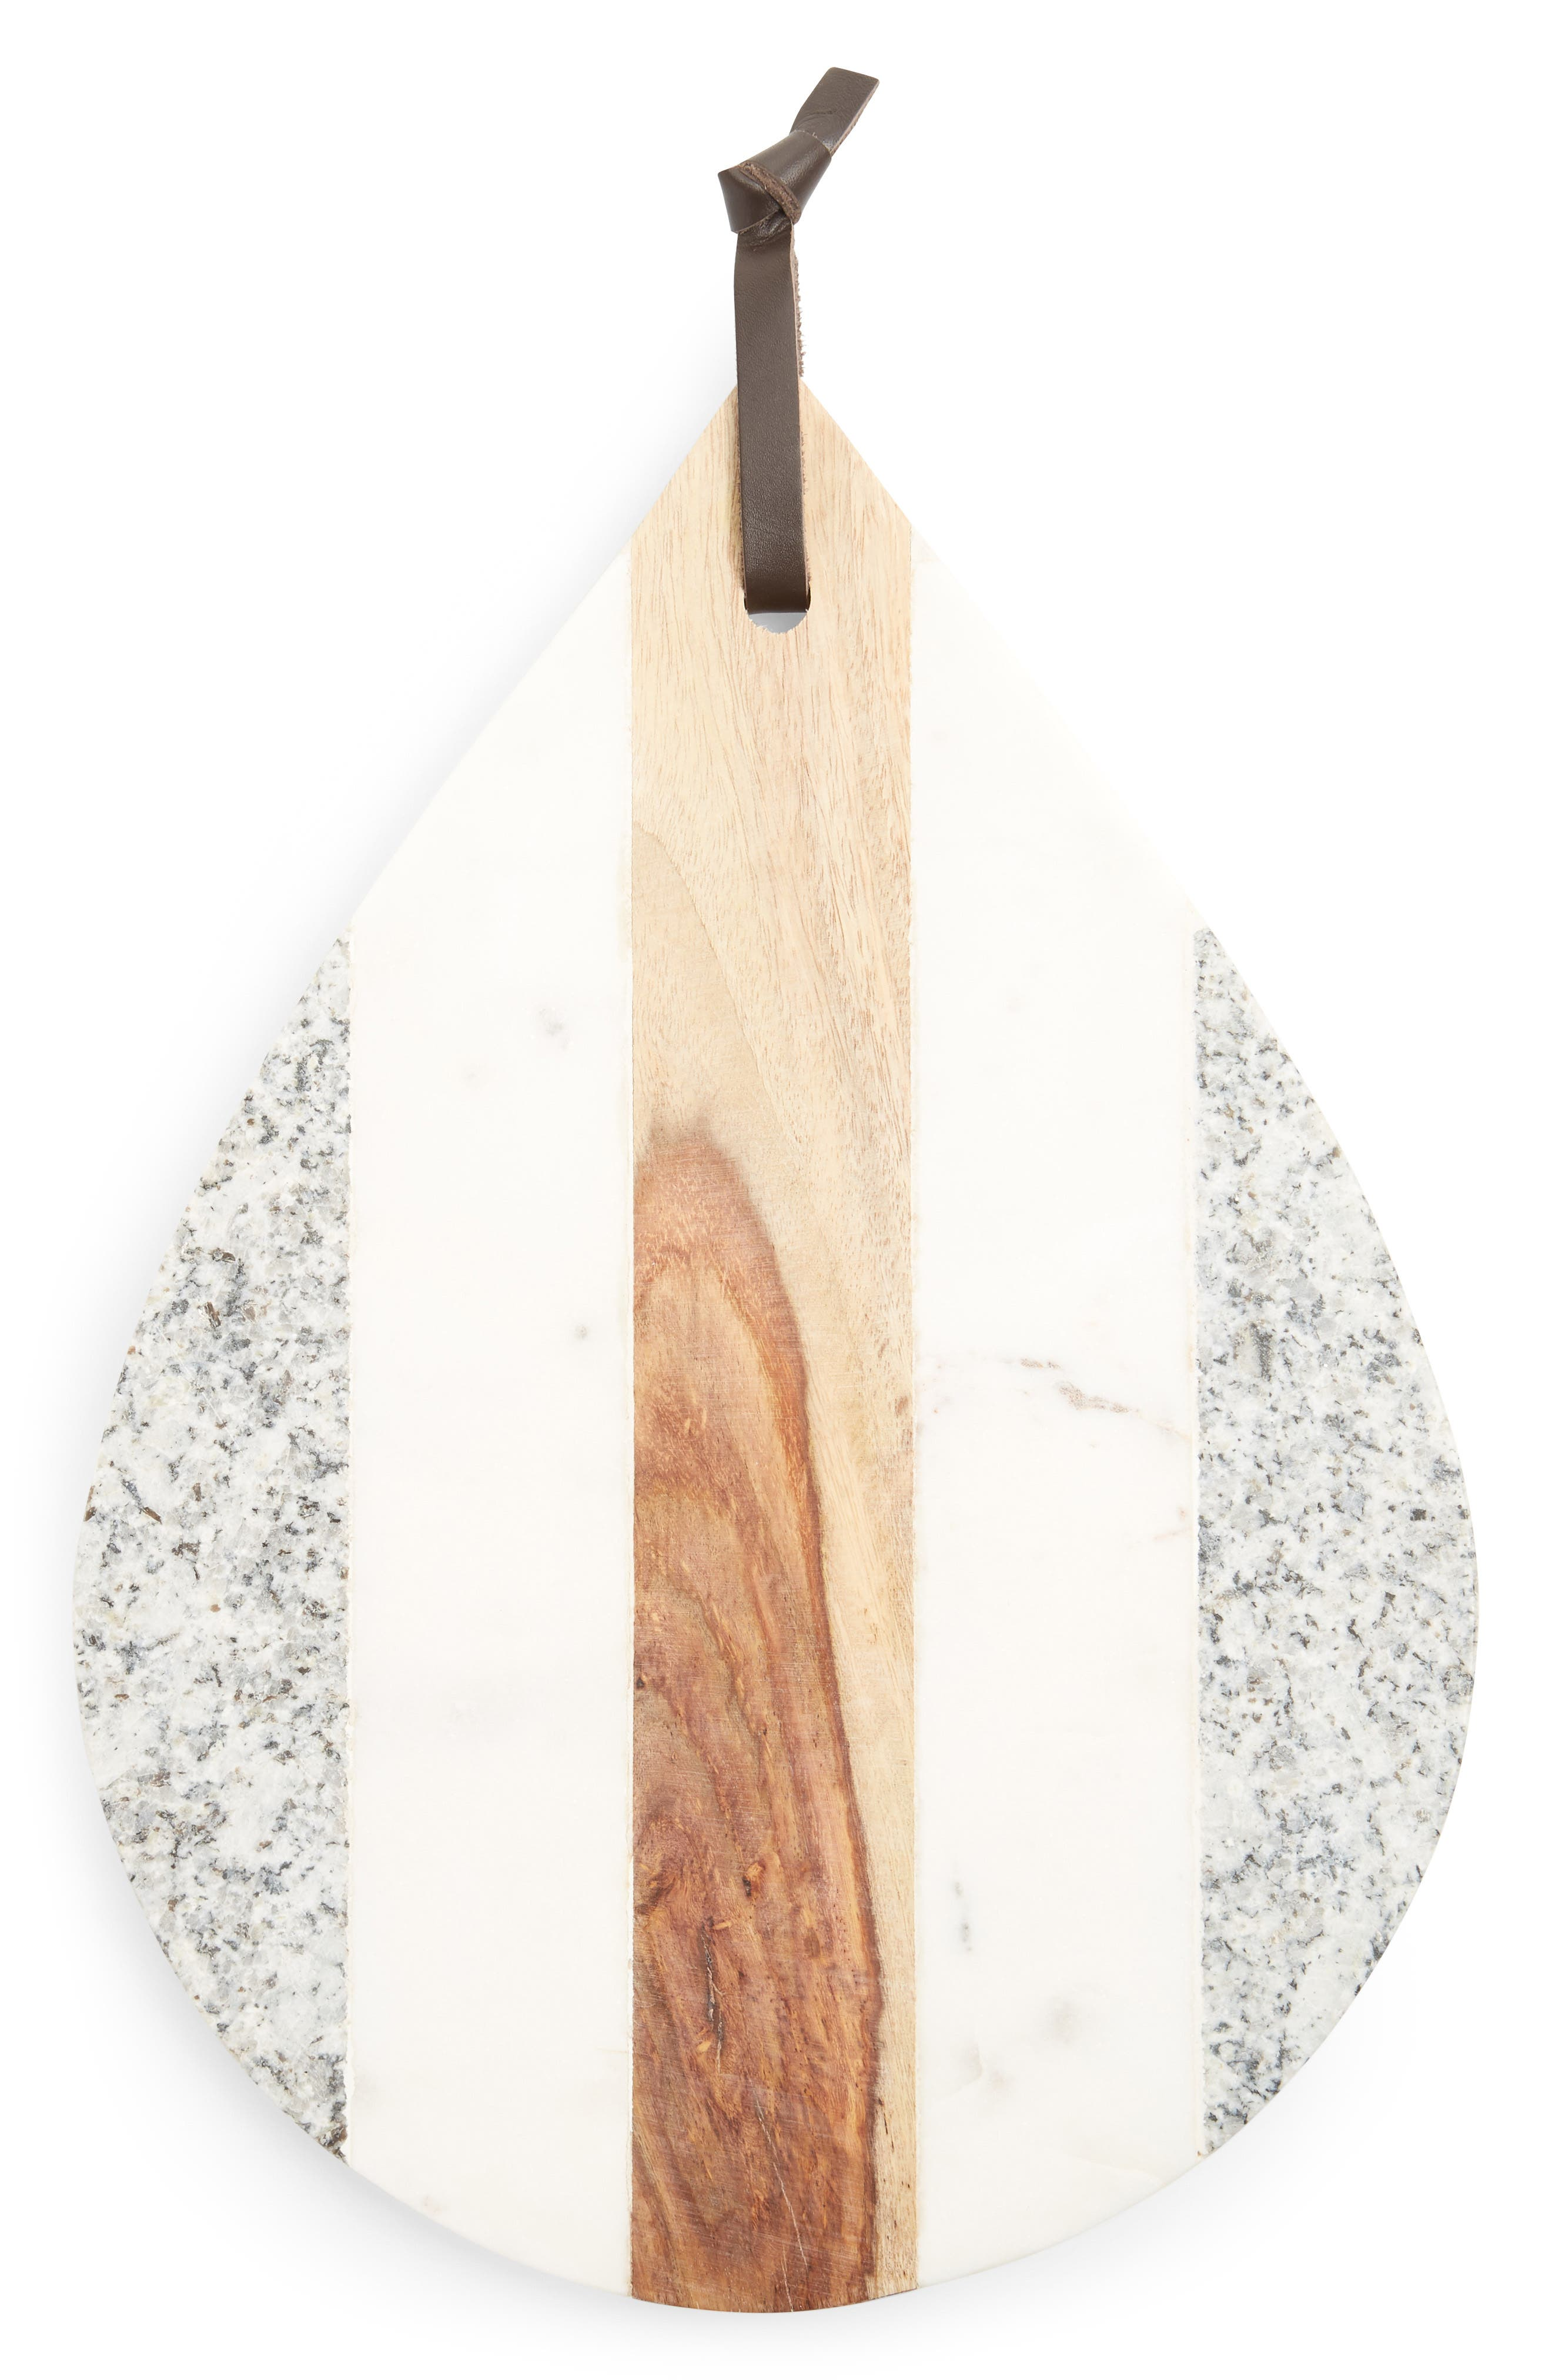 Teardrop Cutting Board,                             Main thumbnail 1, color,                             GREY